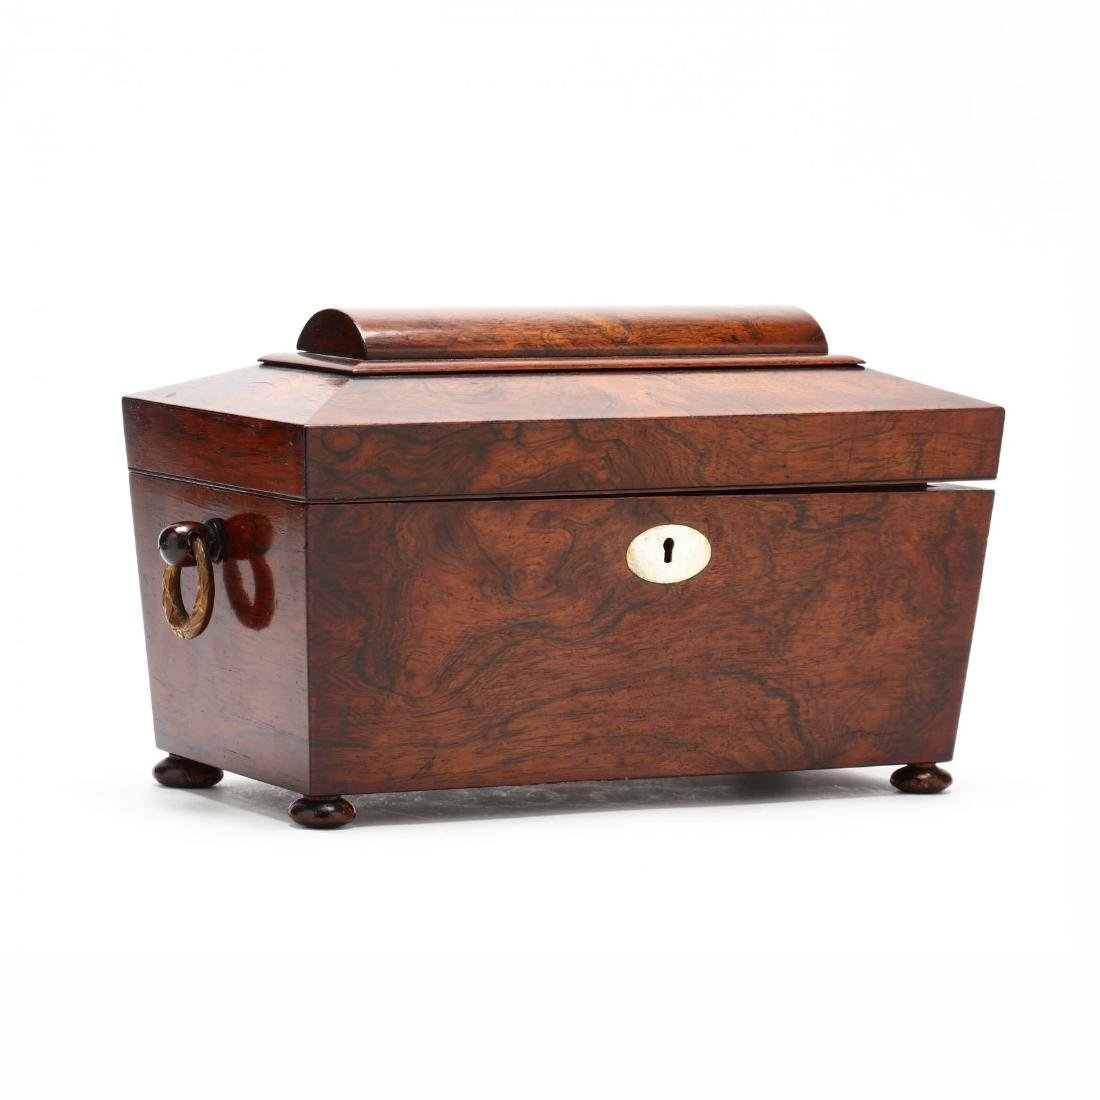 A William IV Rosewood Veneer Tea Caddy